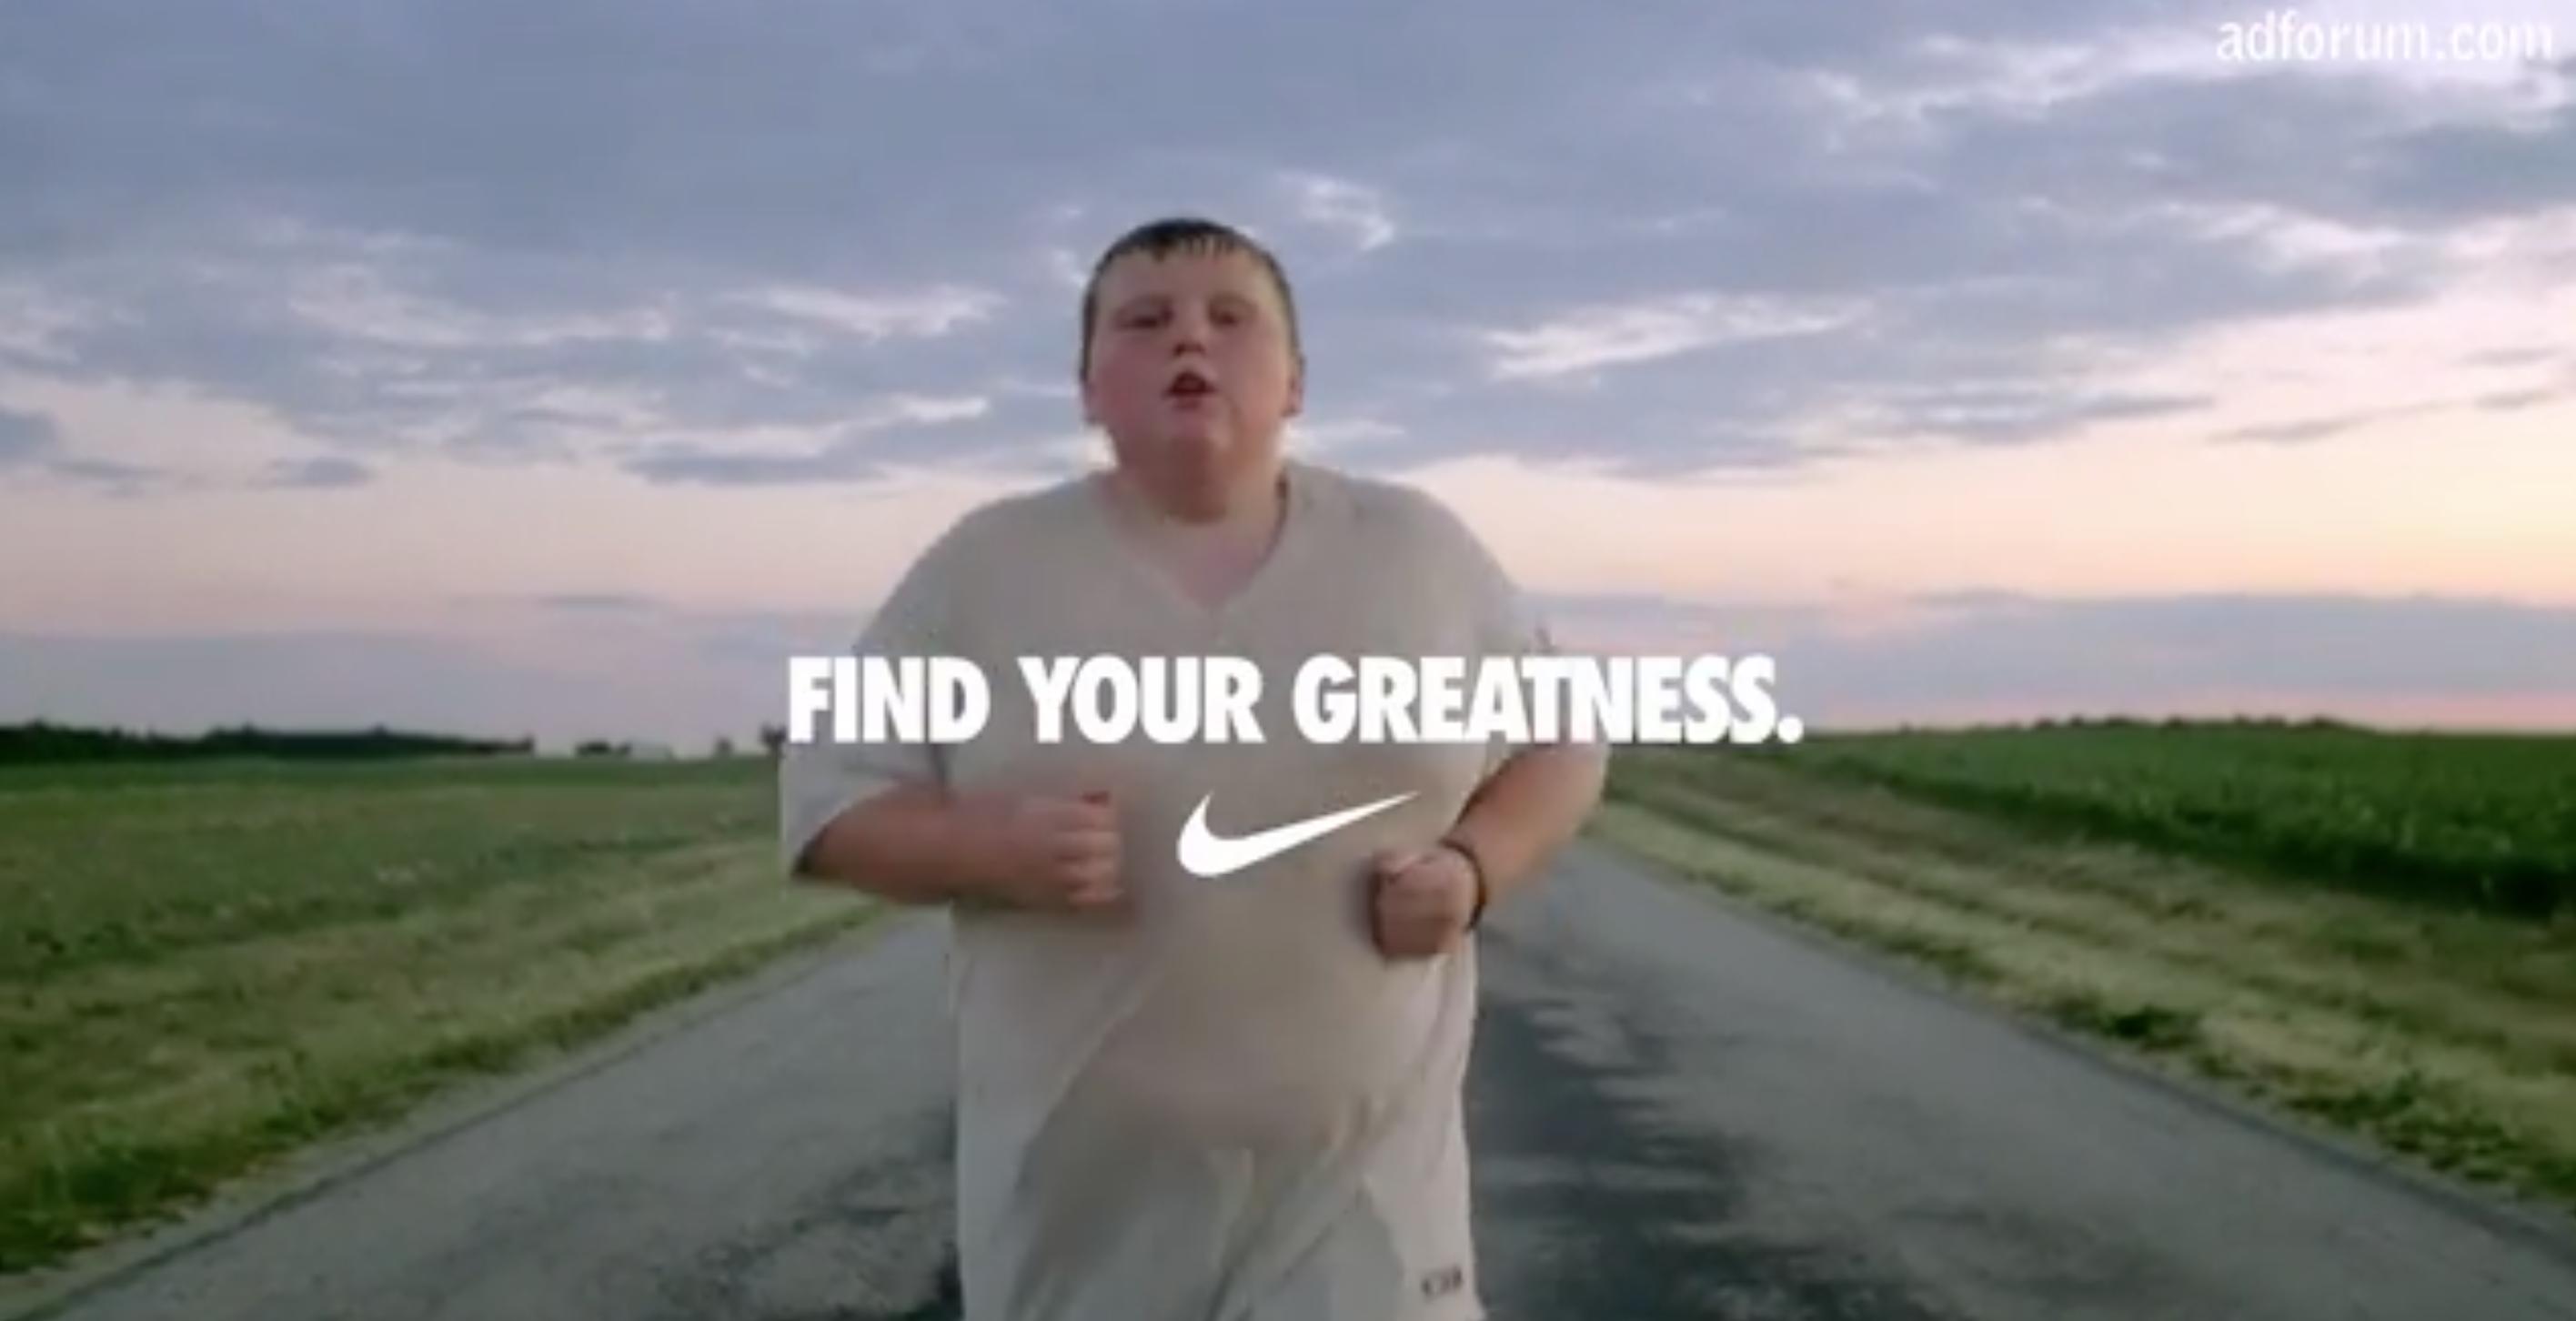 nike ads - Google Search | Ads | Pinterest | Nike ad